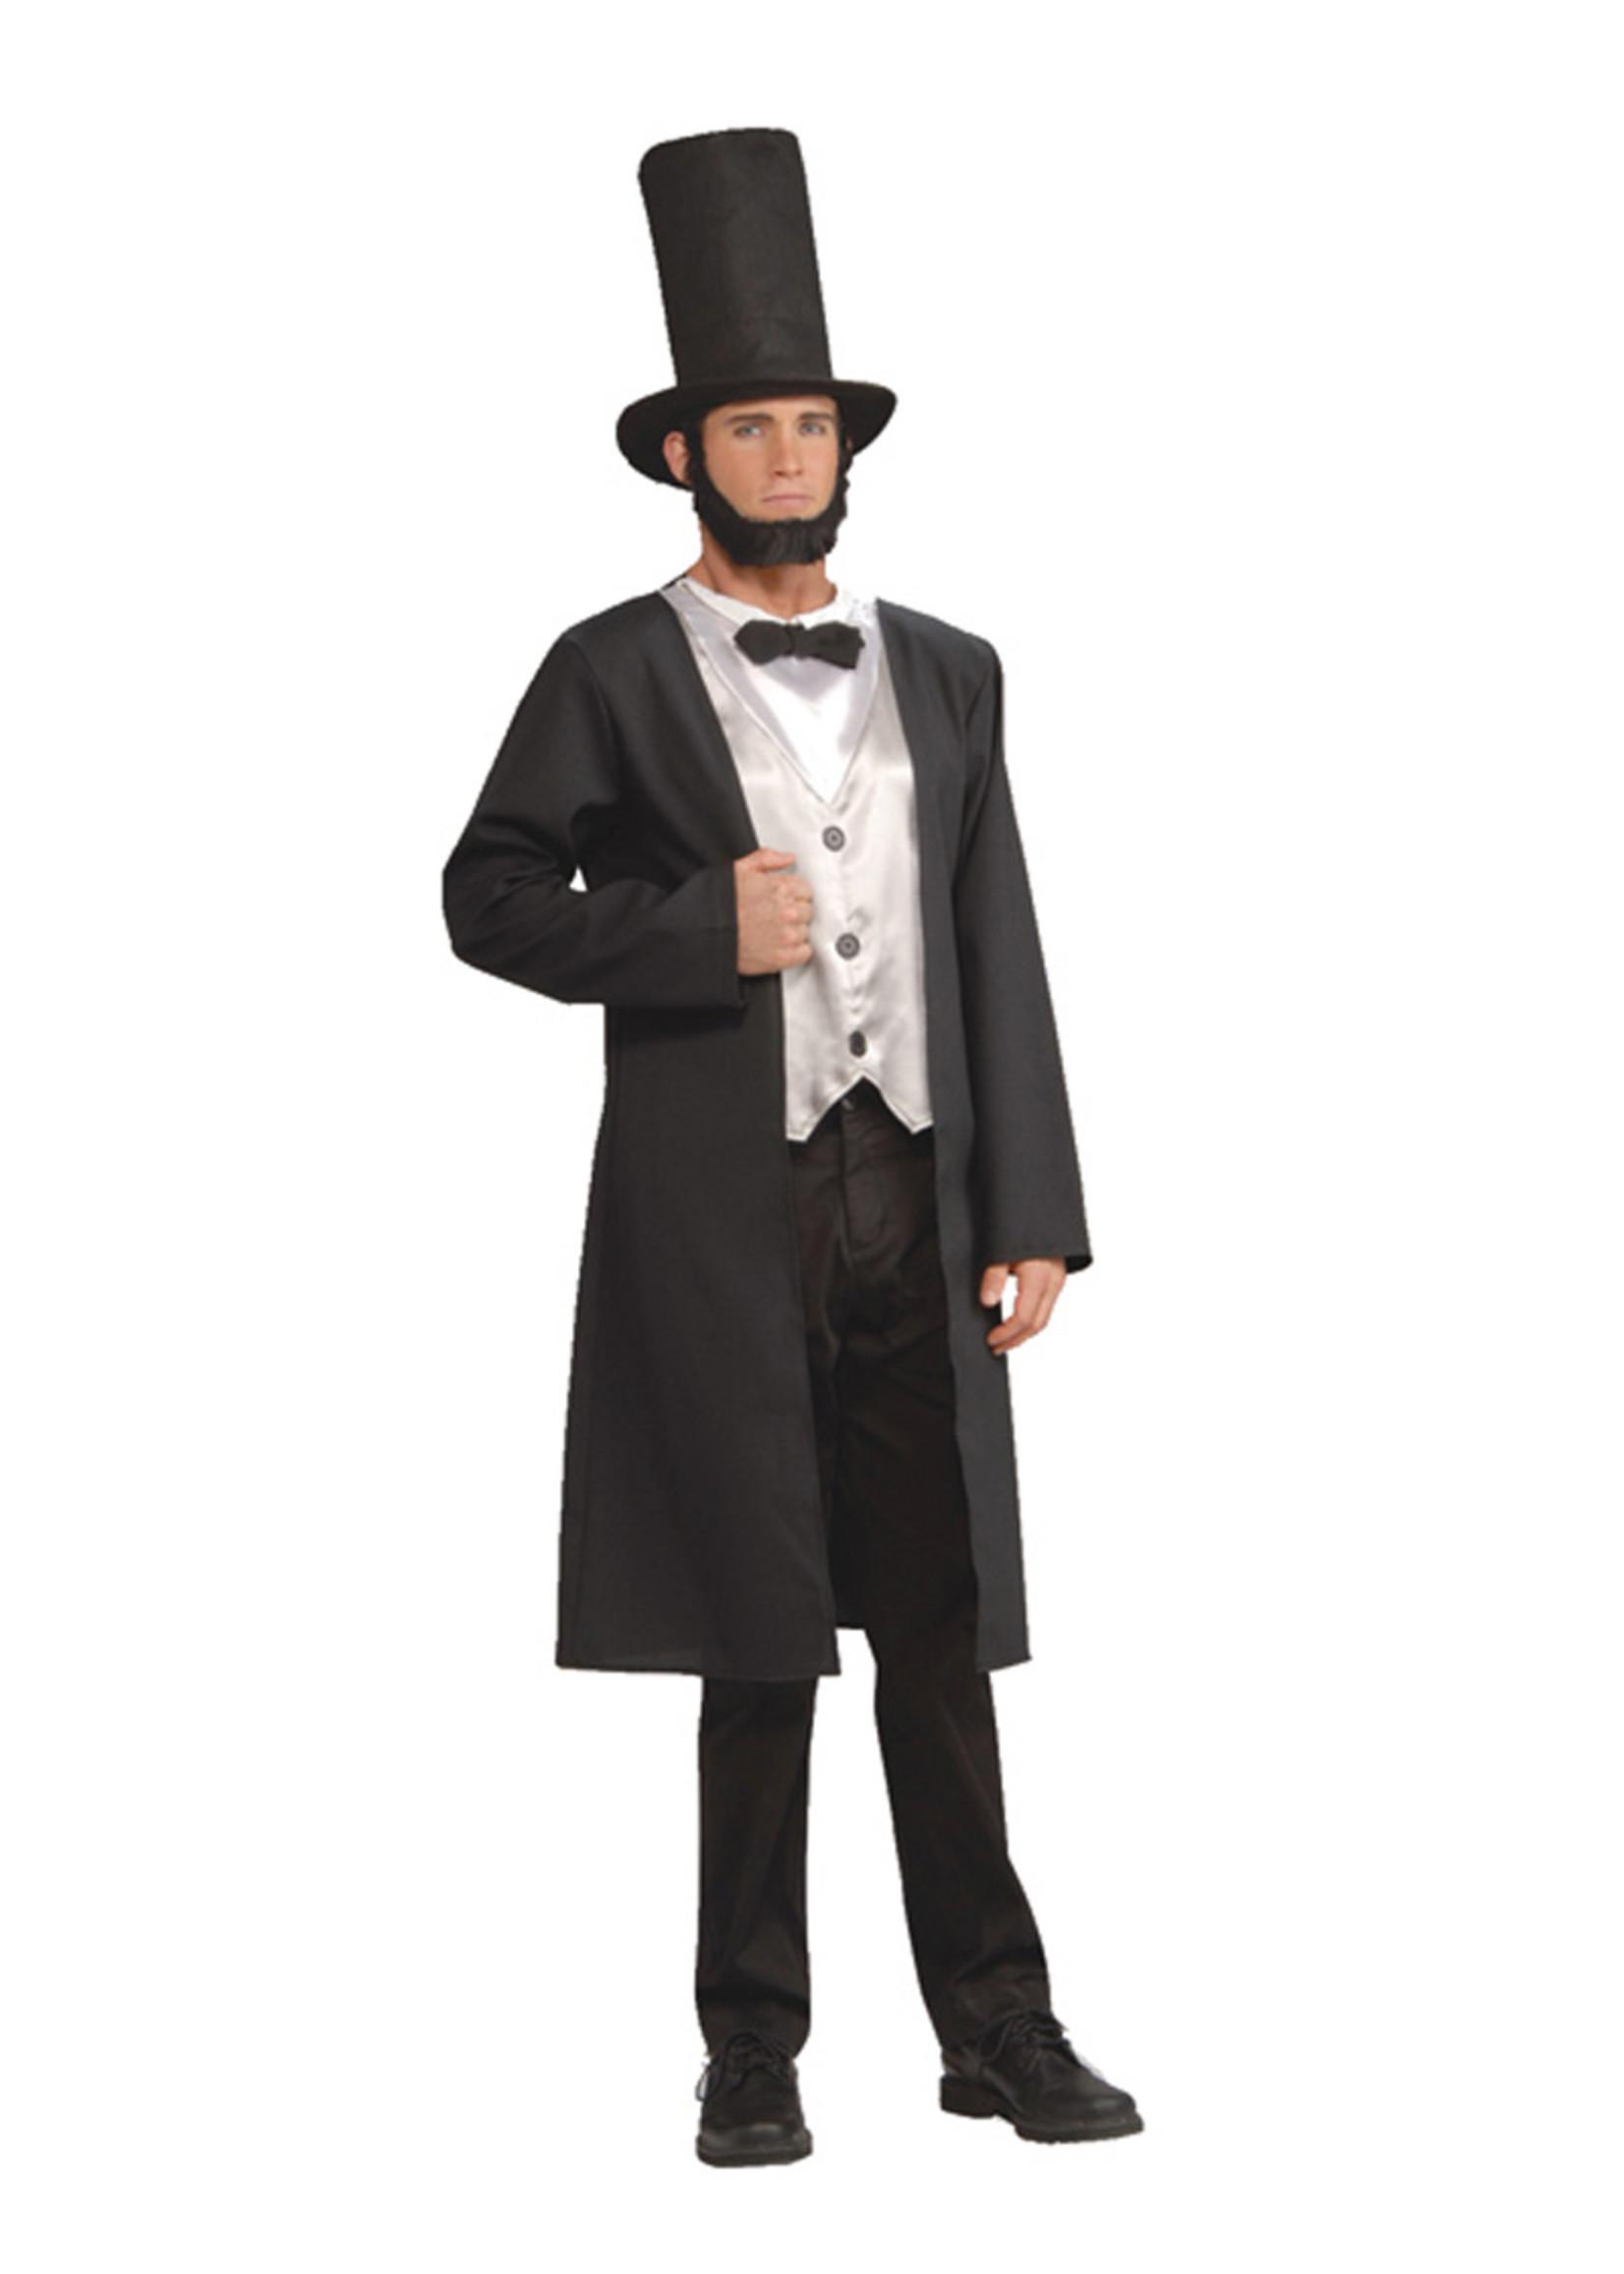 Abe Lincoln Costume - Men's